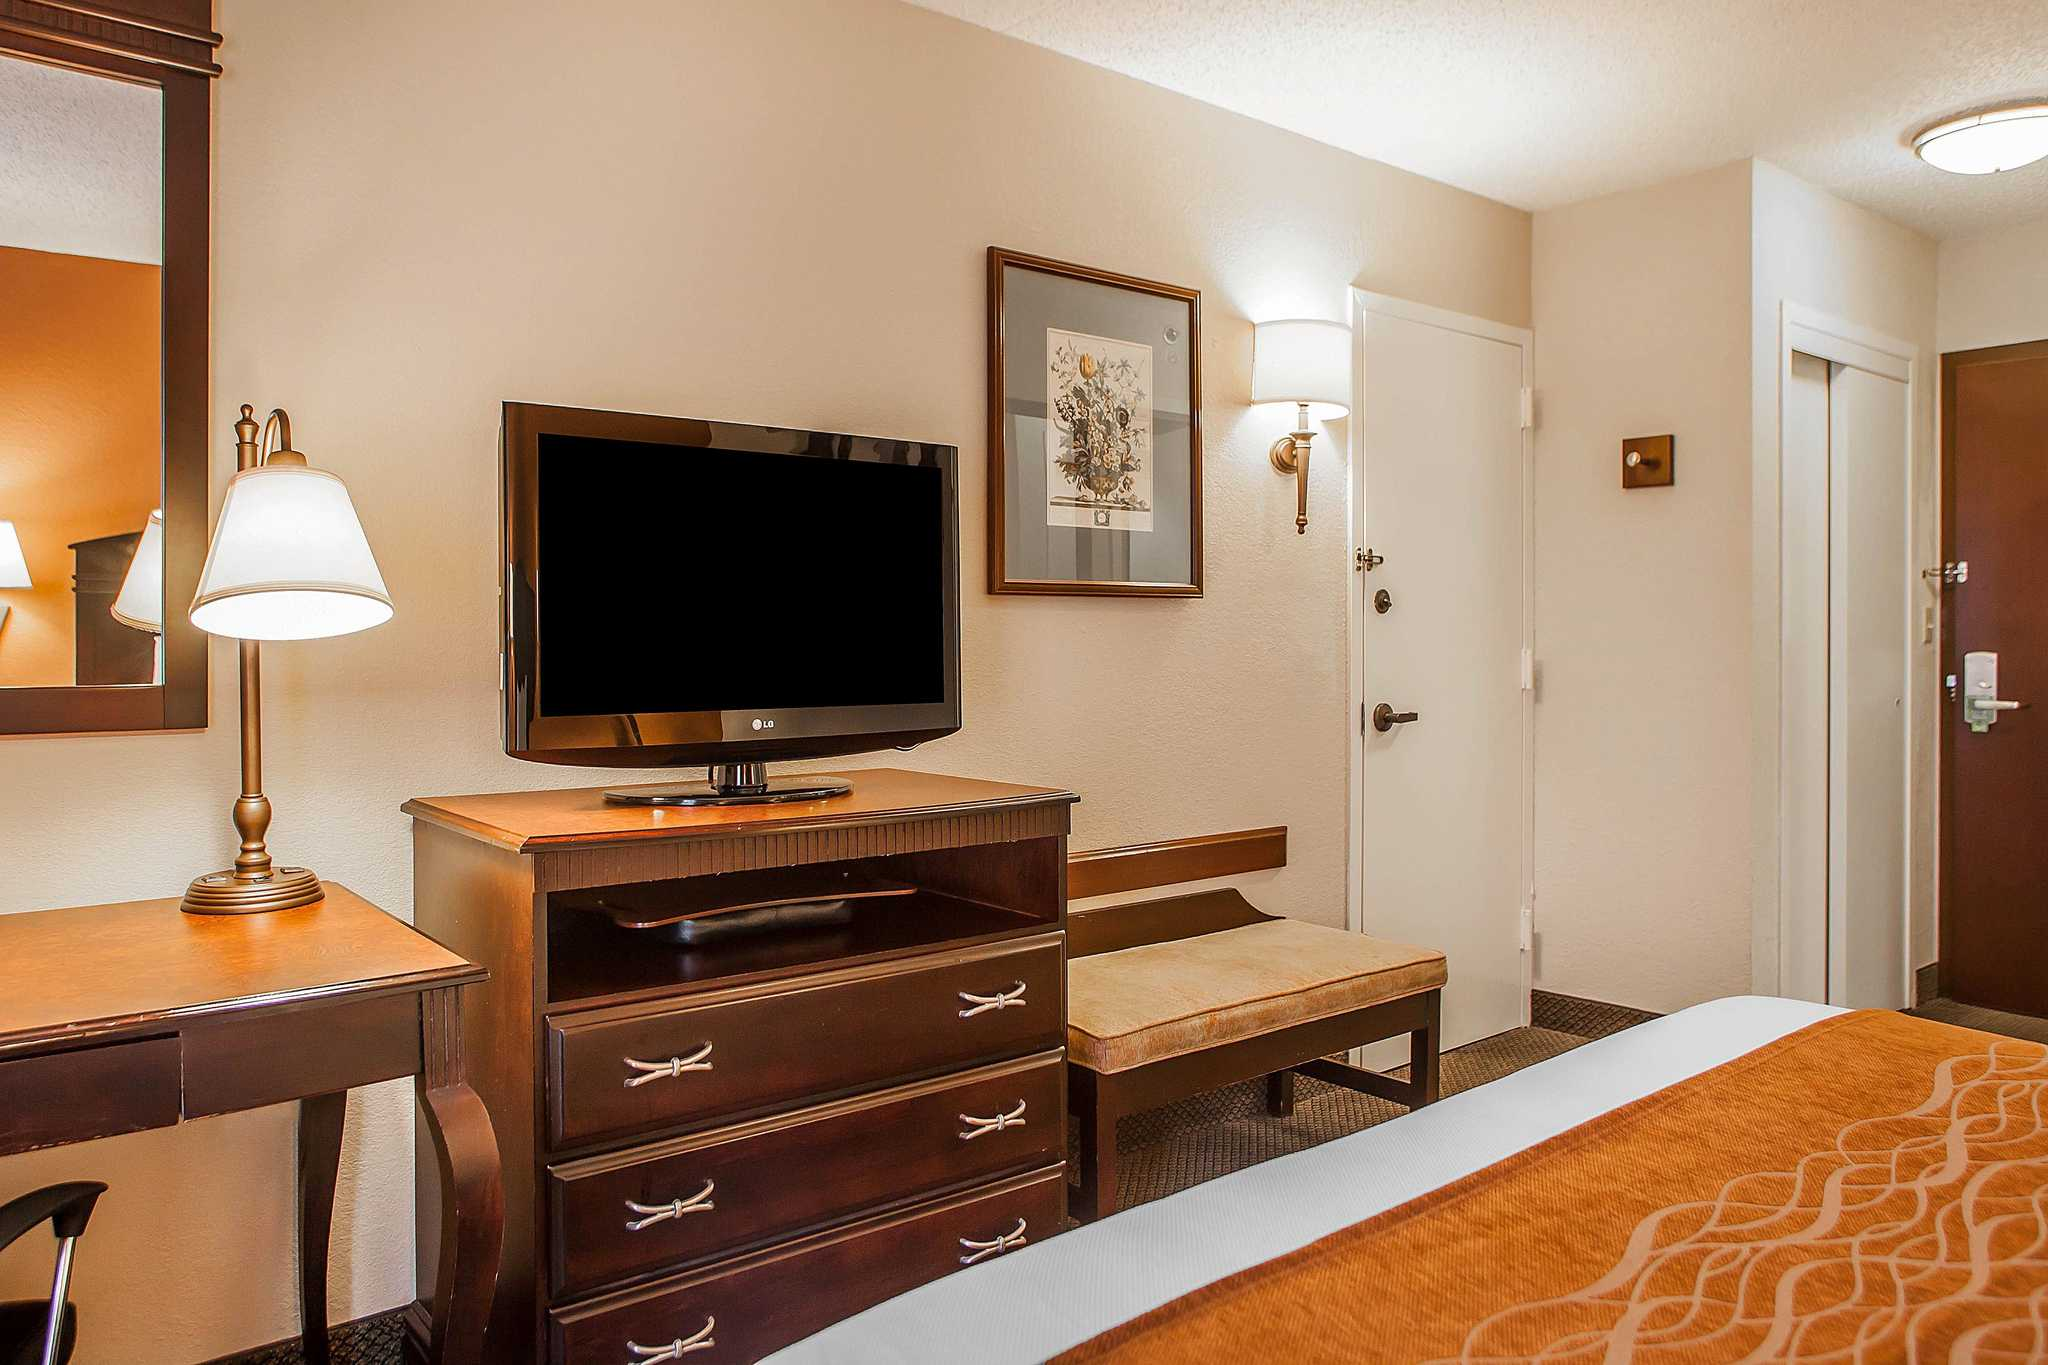 comfort inn amp suites somerset new jersey nj - Hilton Garden Inn Bridgewater